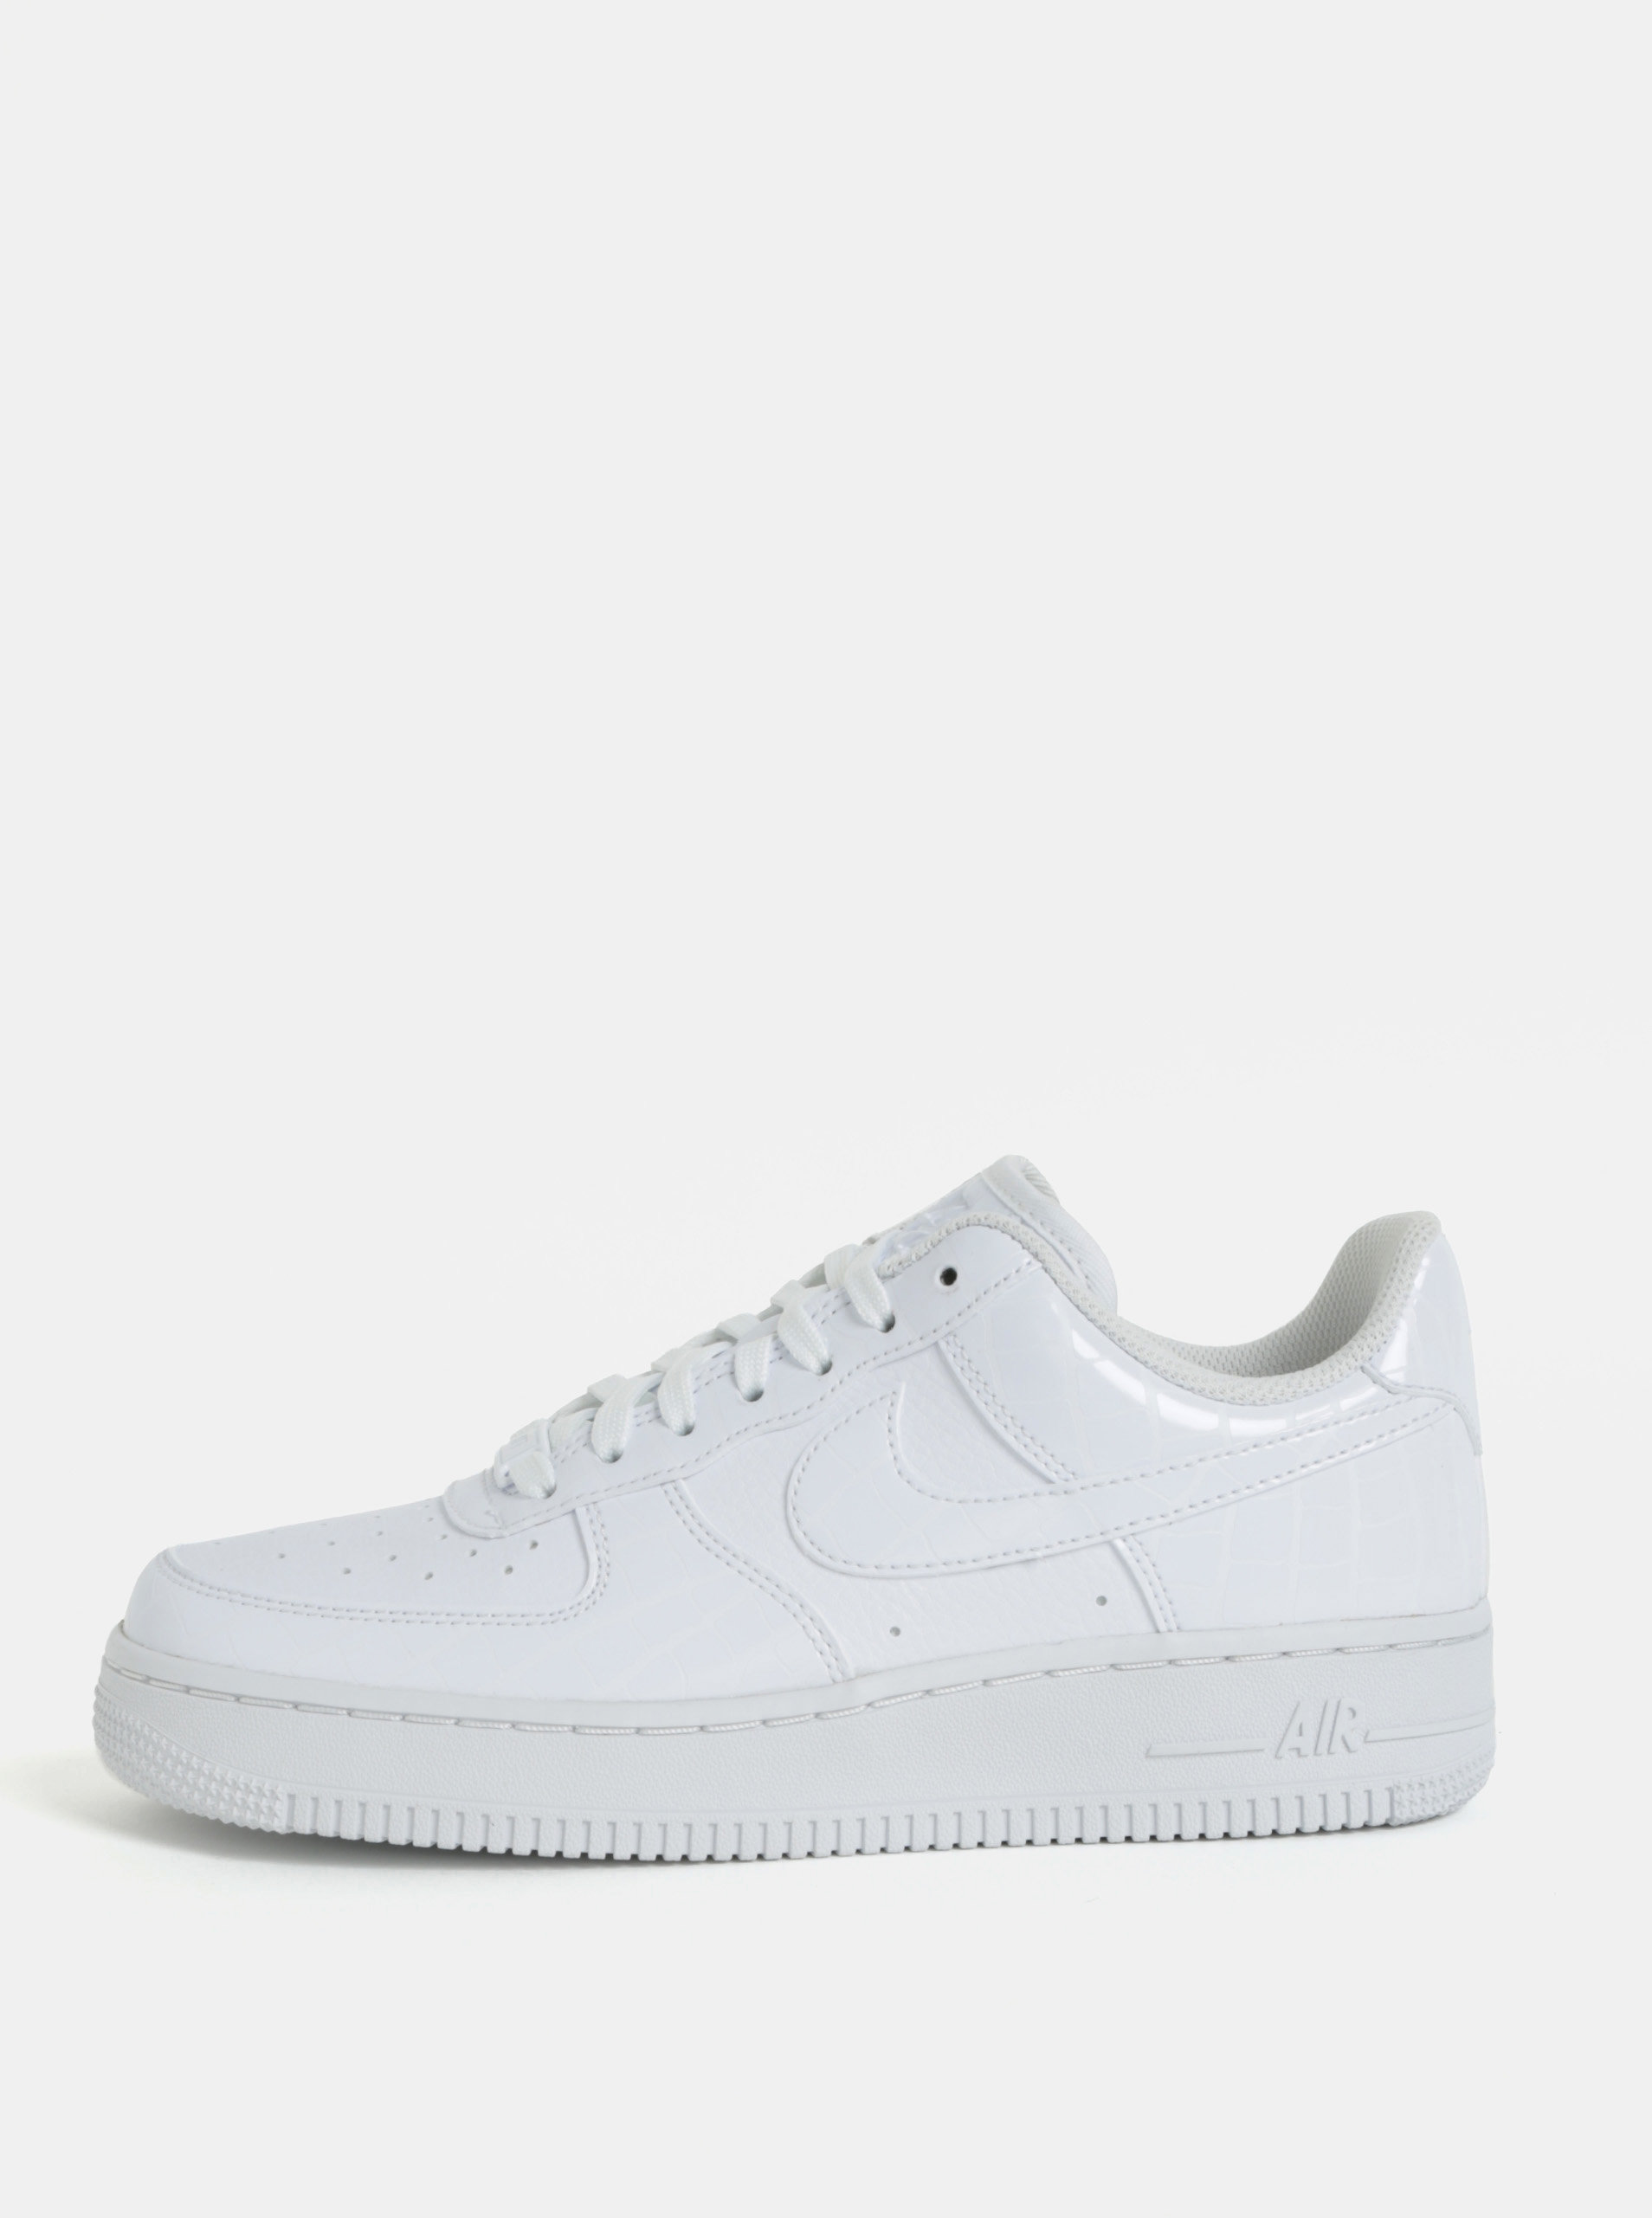 Bílé dámské tenisky na platformě Nike Air Force1 ... d2e8e7c5e97